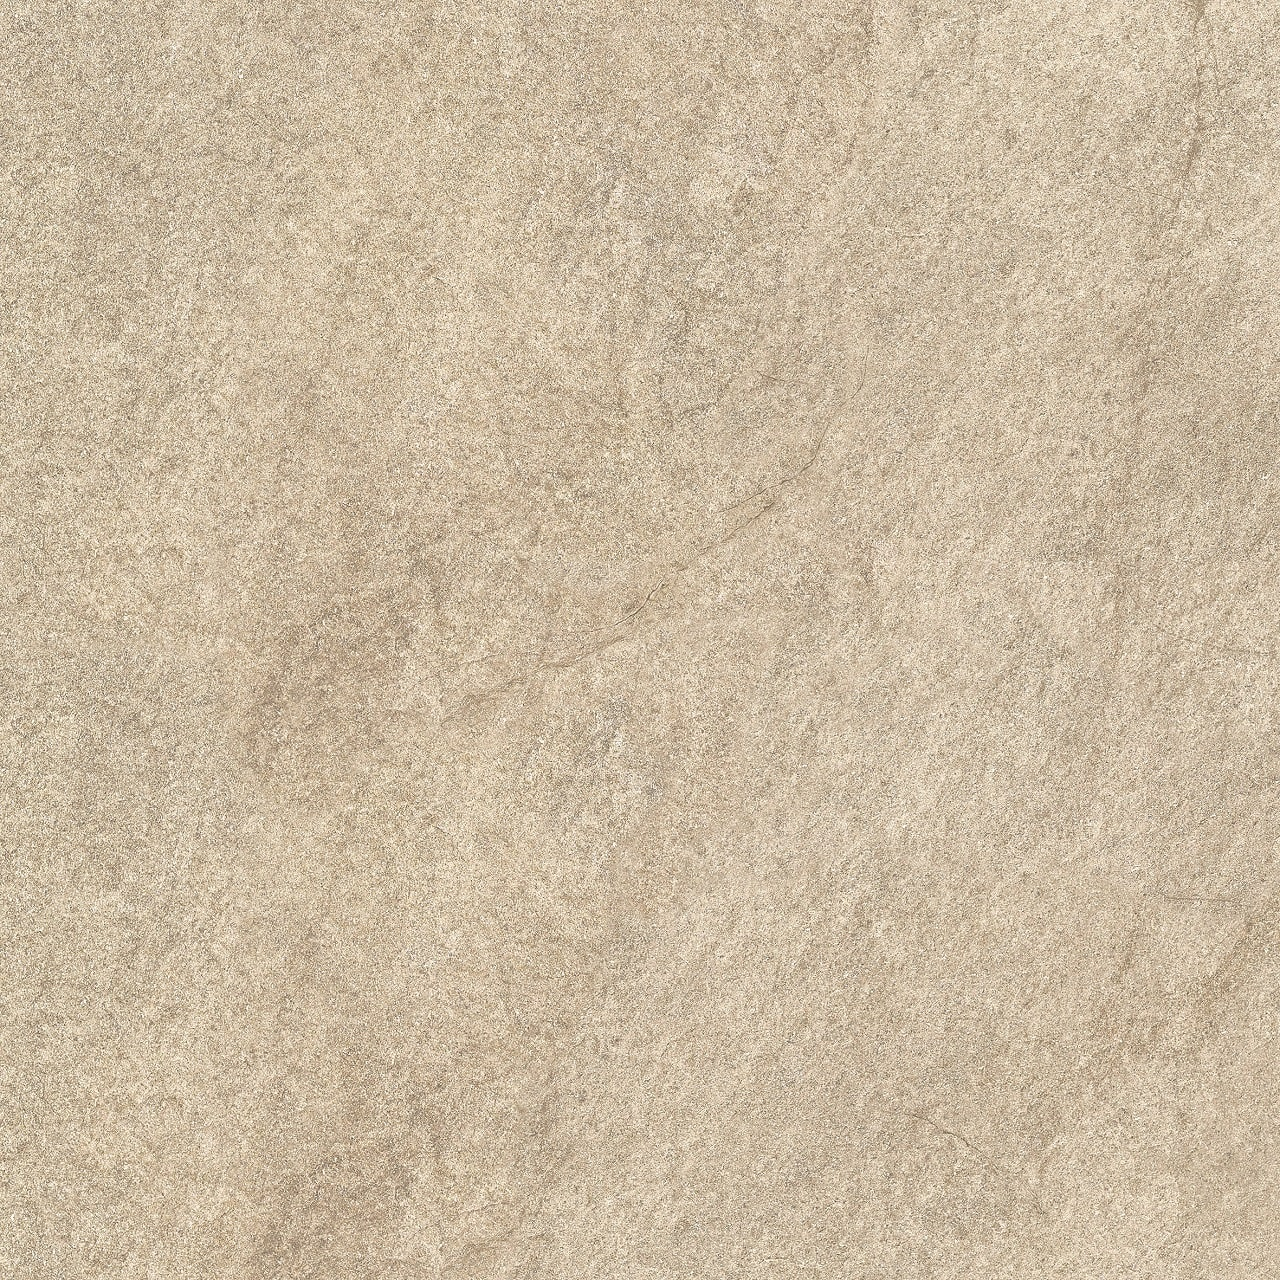 Płytka tarasowa Stargres Pietra Serena Cream 60x60cm 2cm